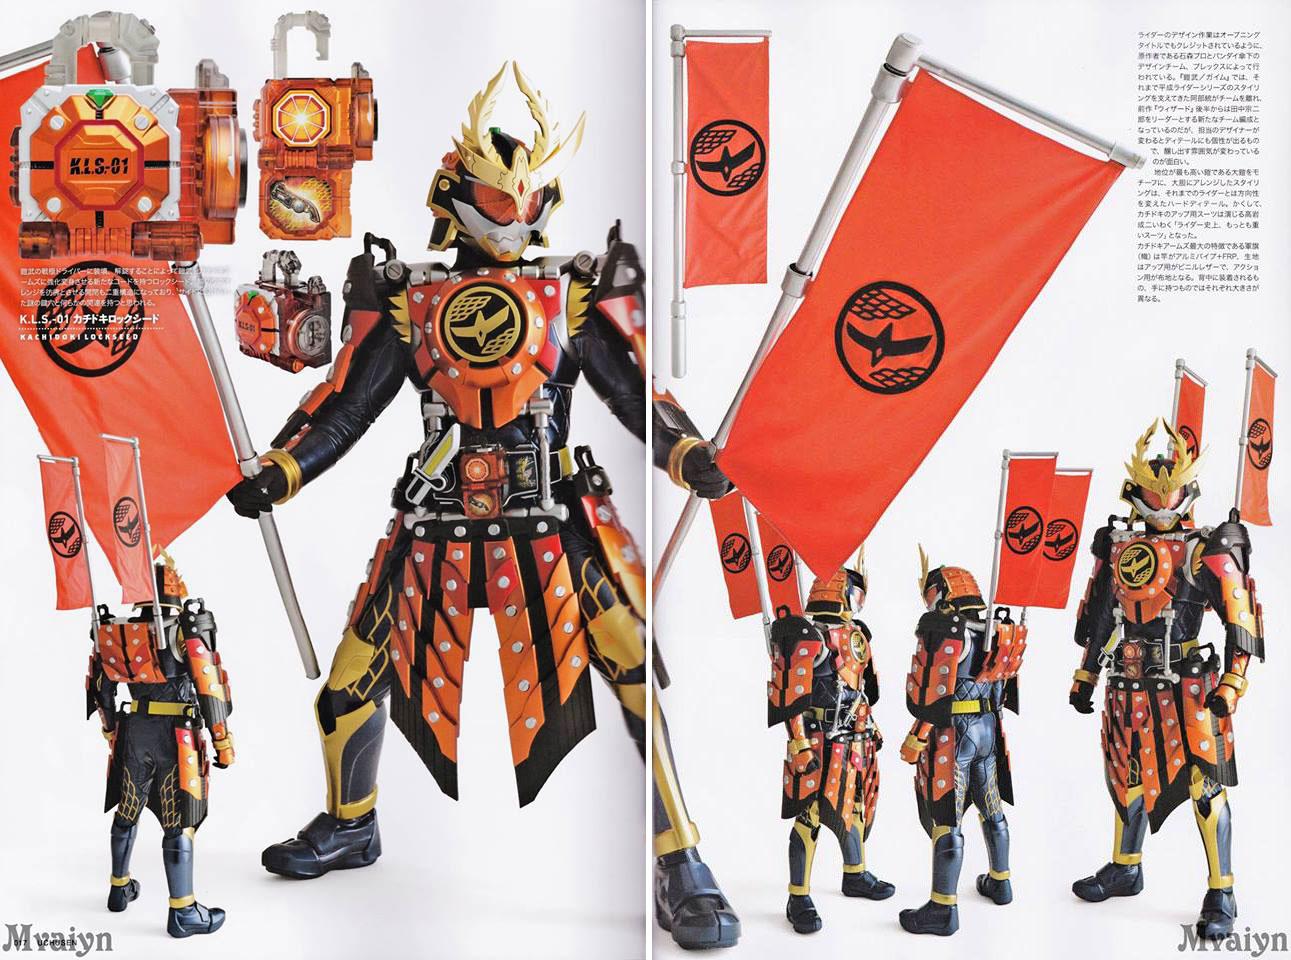 Kamen Rider Gaim - Kachidoki Arms (Image 1, 2) by Kamen ...